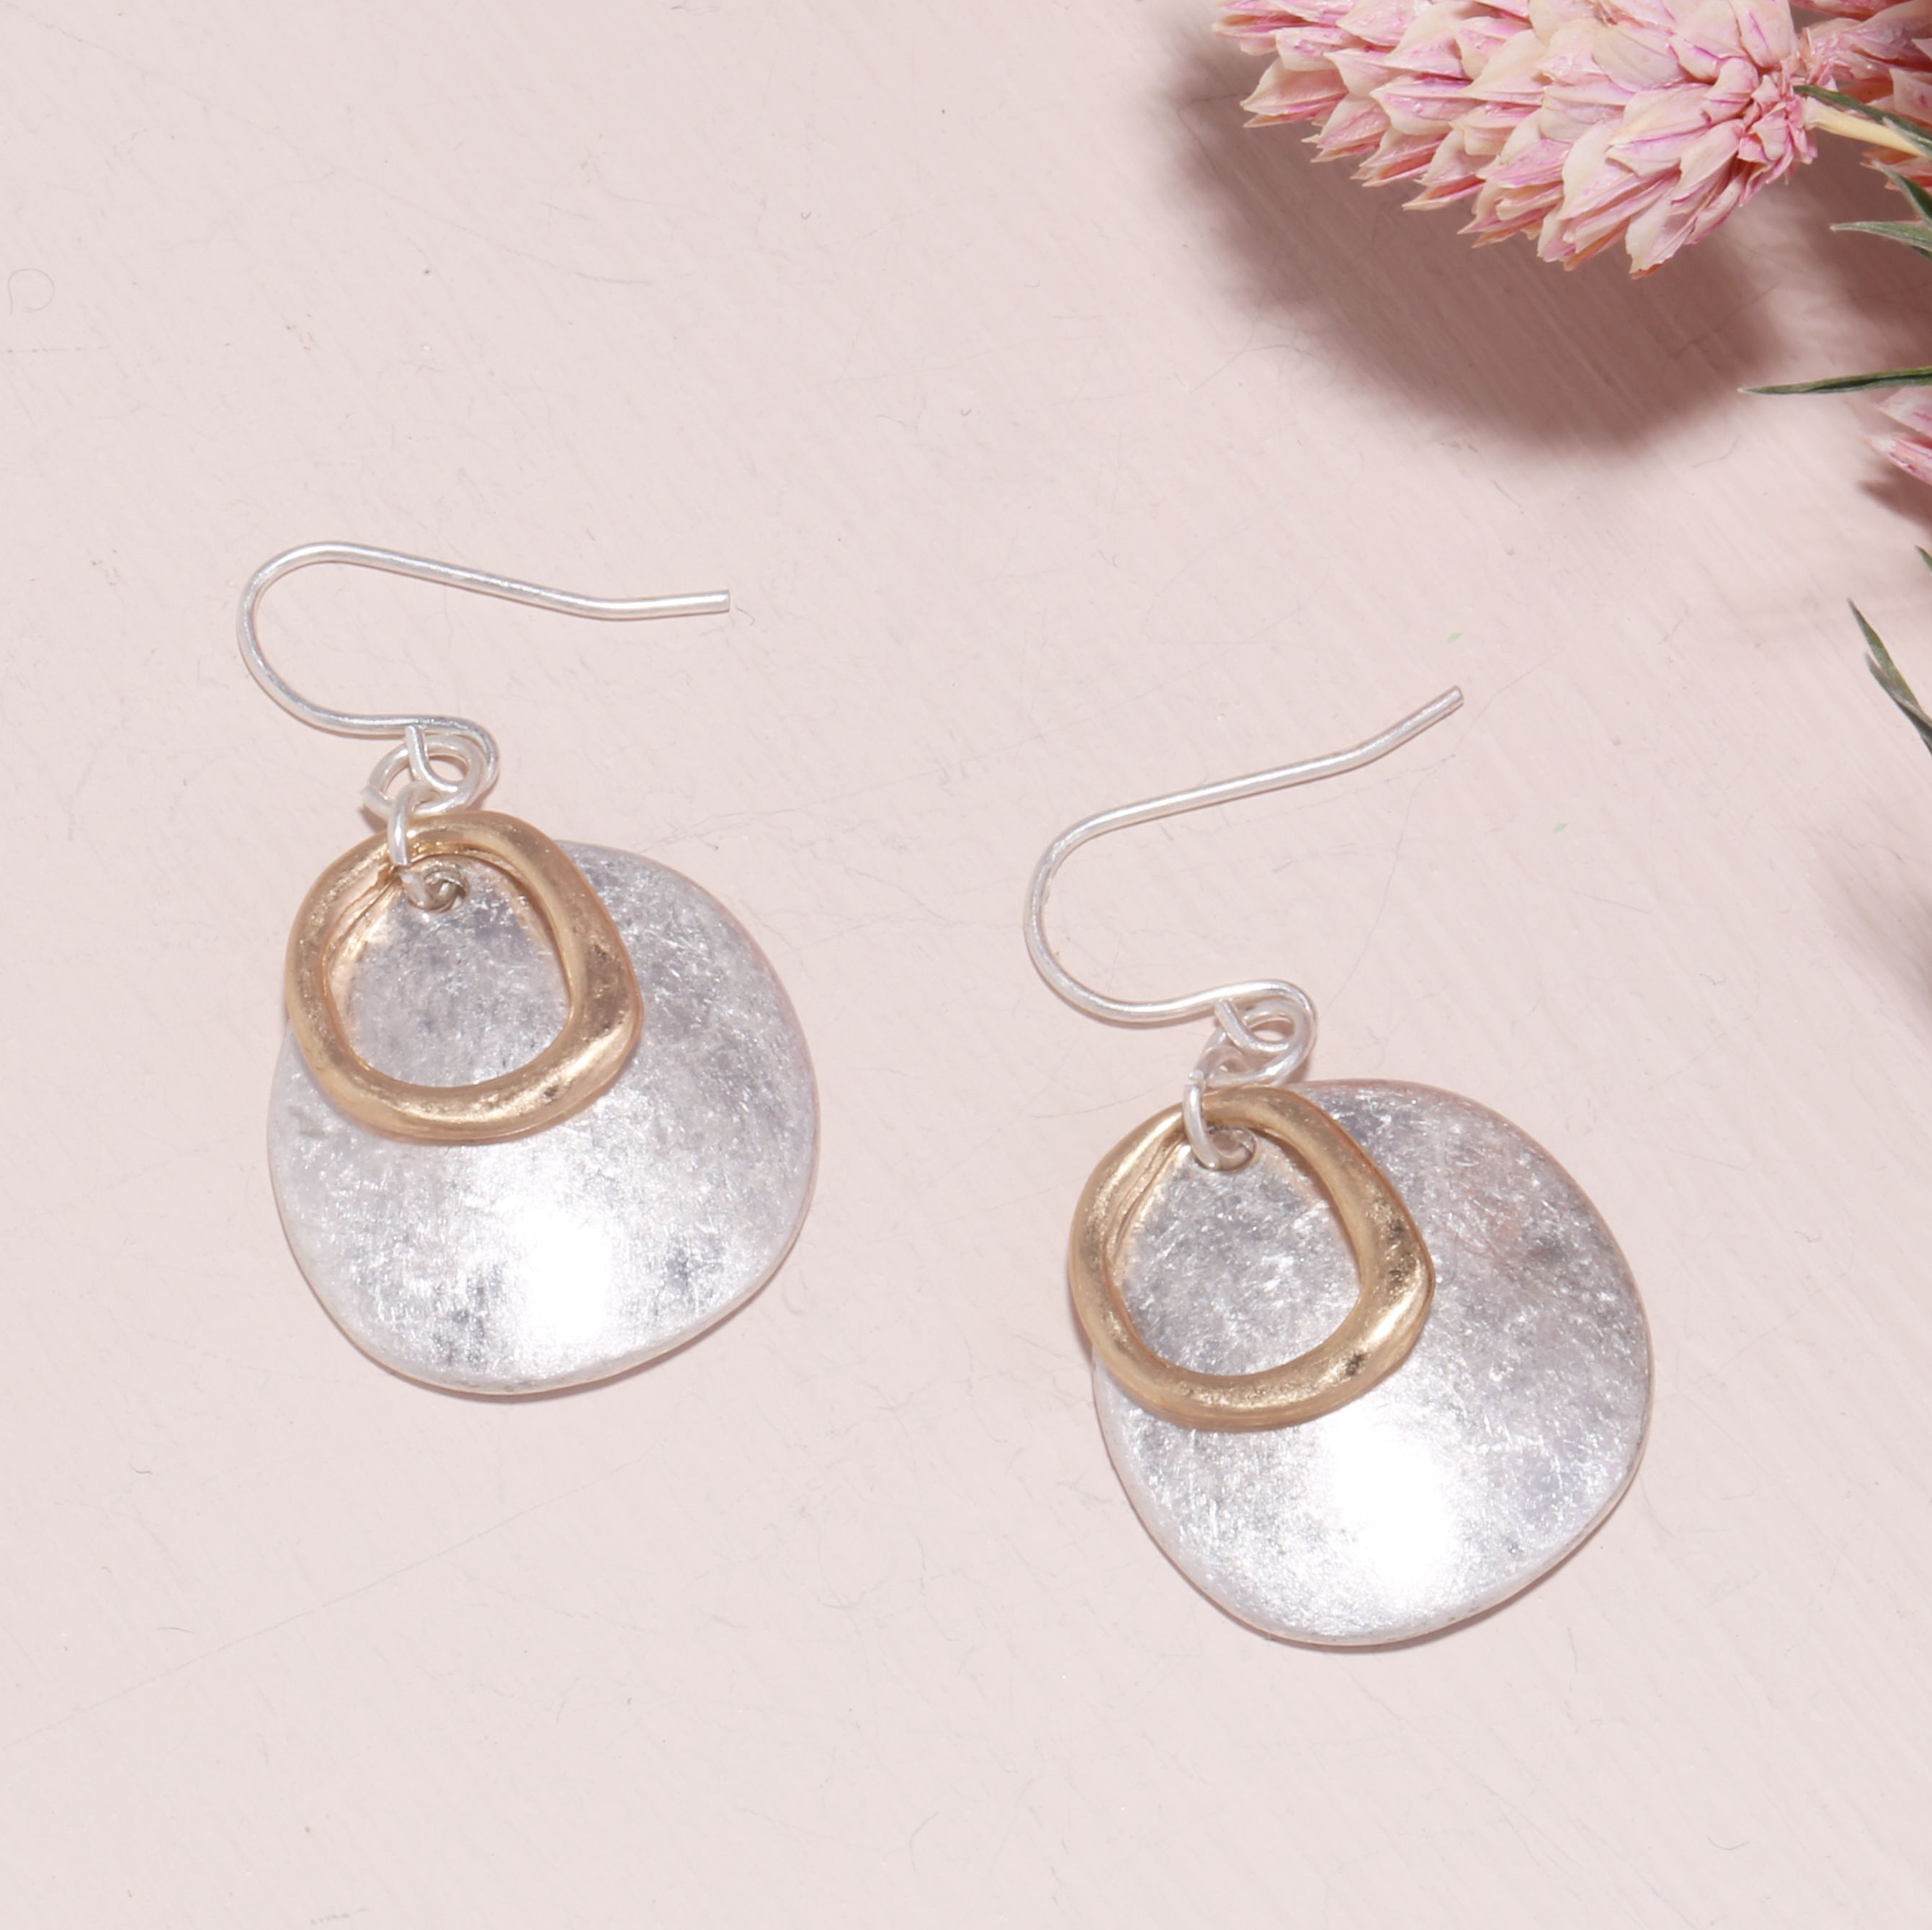 Vintage Geometric Double Layers Large Circle Ear Stud Drop Dangle Hook Earrings